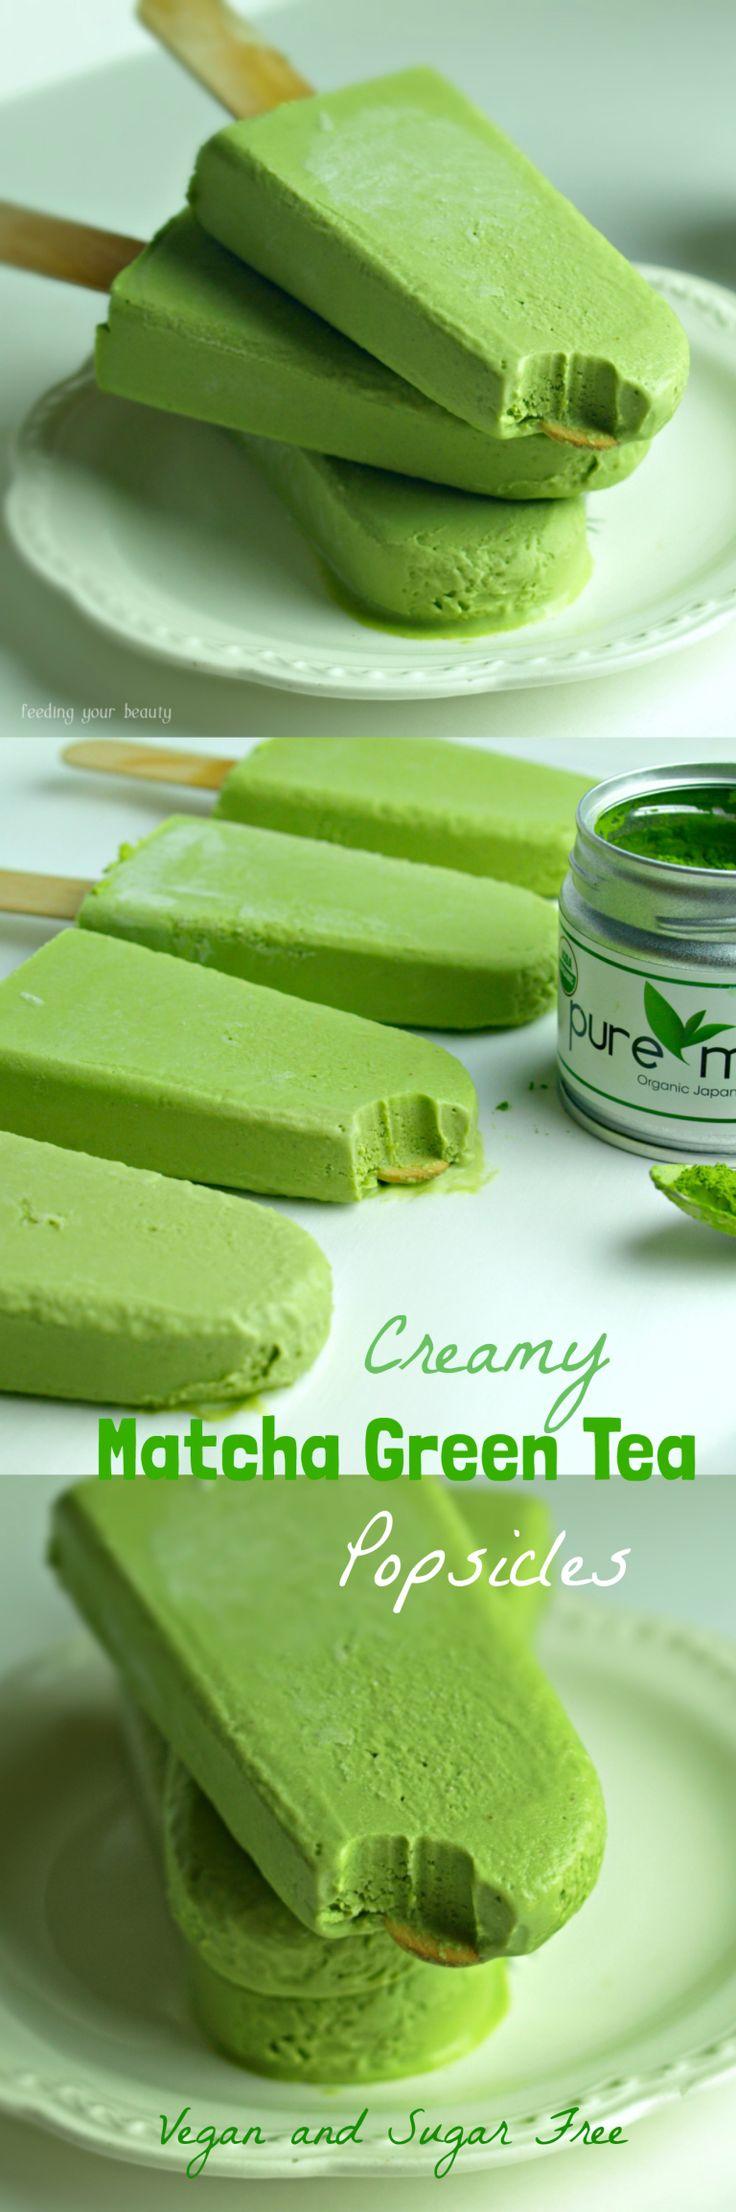 Creamy Matcha Green Tea Popsicles - Vegan and Sugar Free